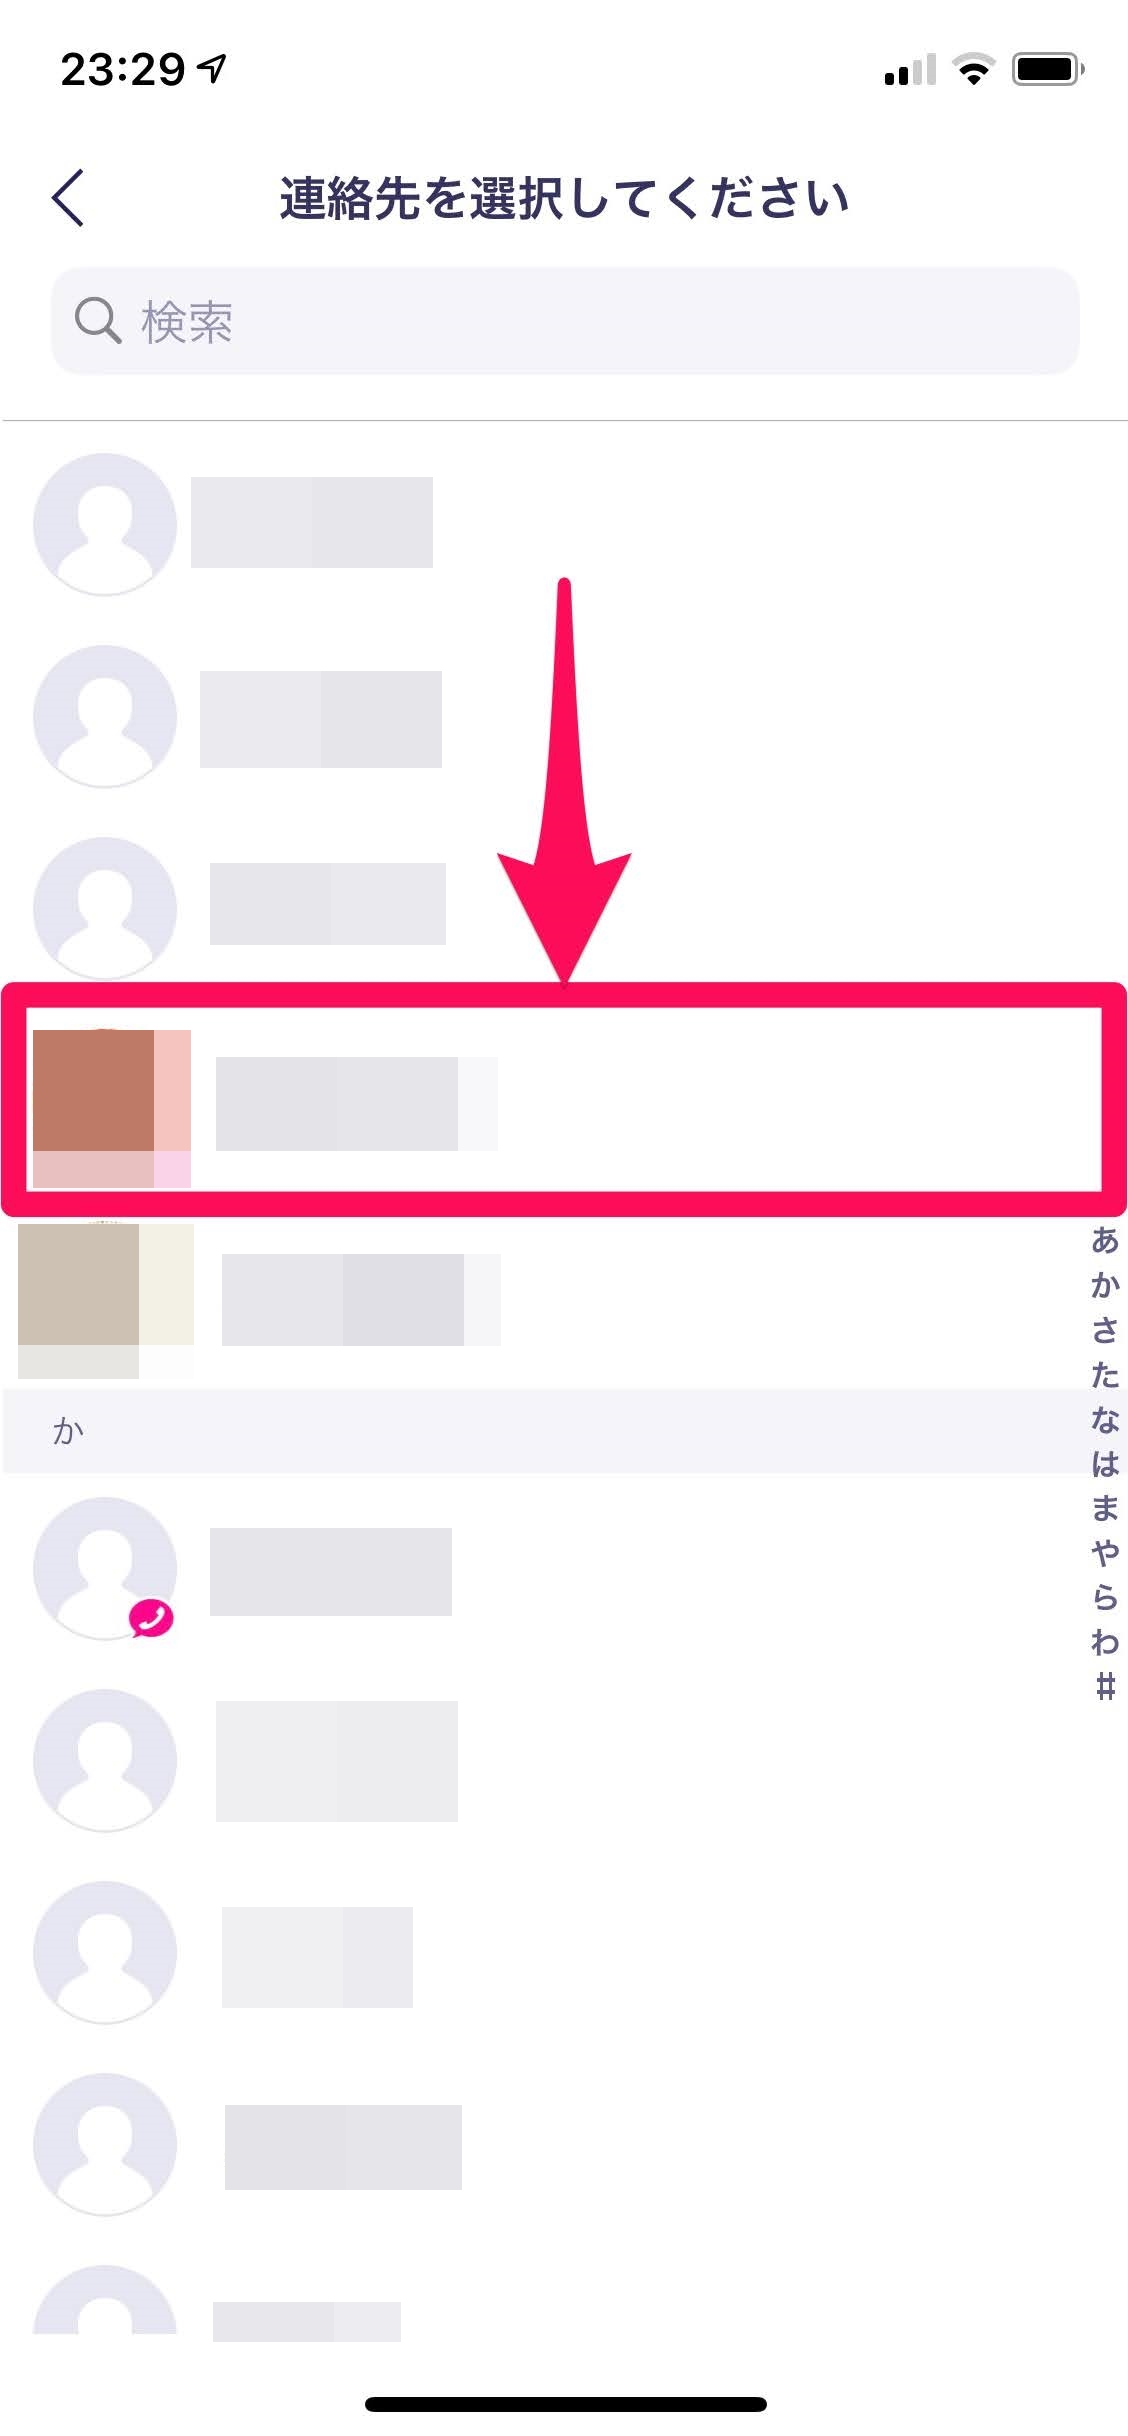 Rakuten Link 国際SMSの手順03